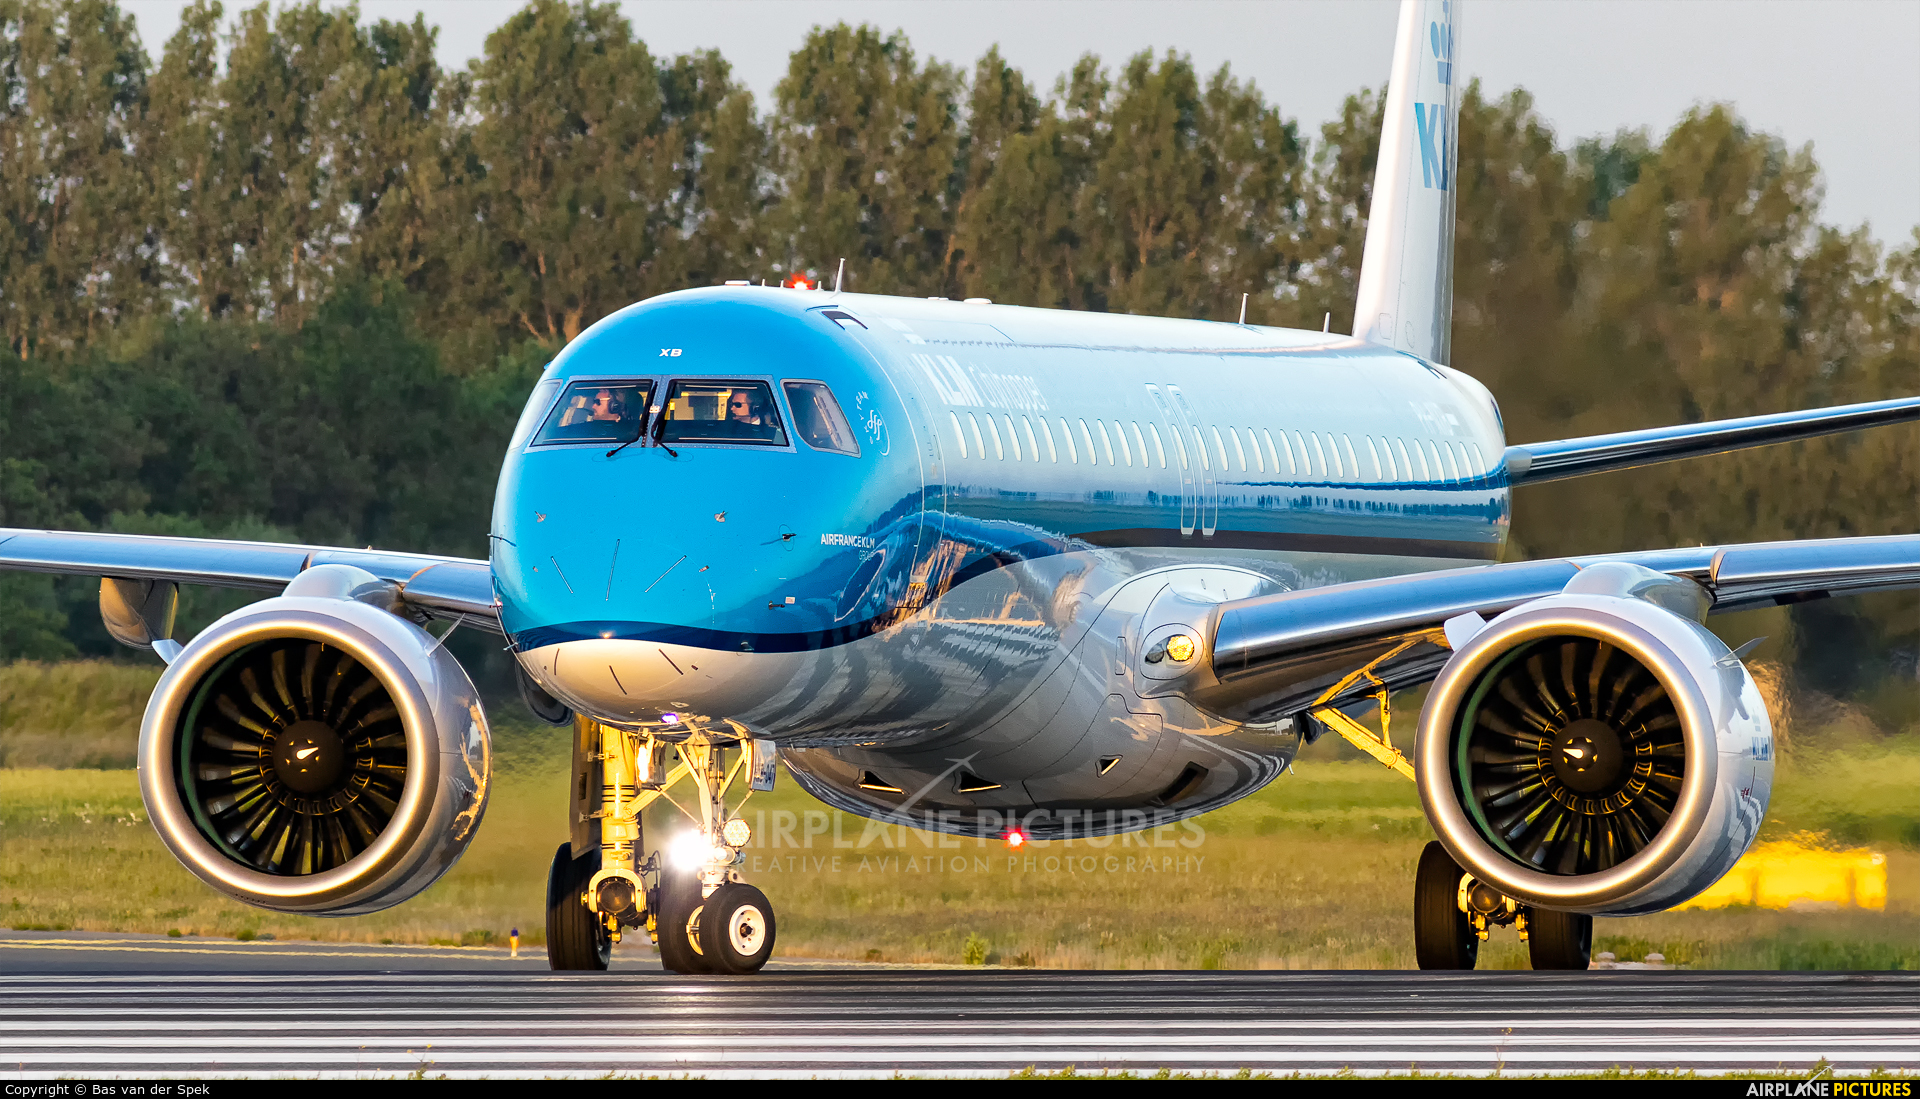 KLM Cityhopper PH-NXB aircraft at Amsterdam - Schiphol